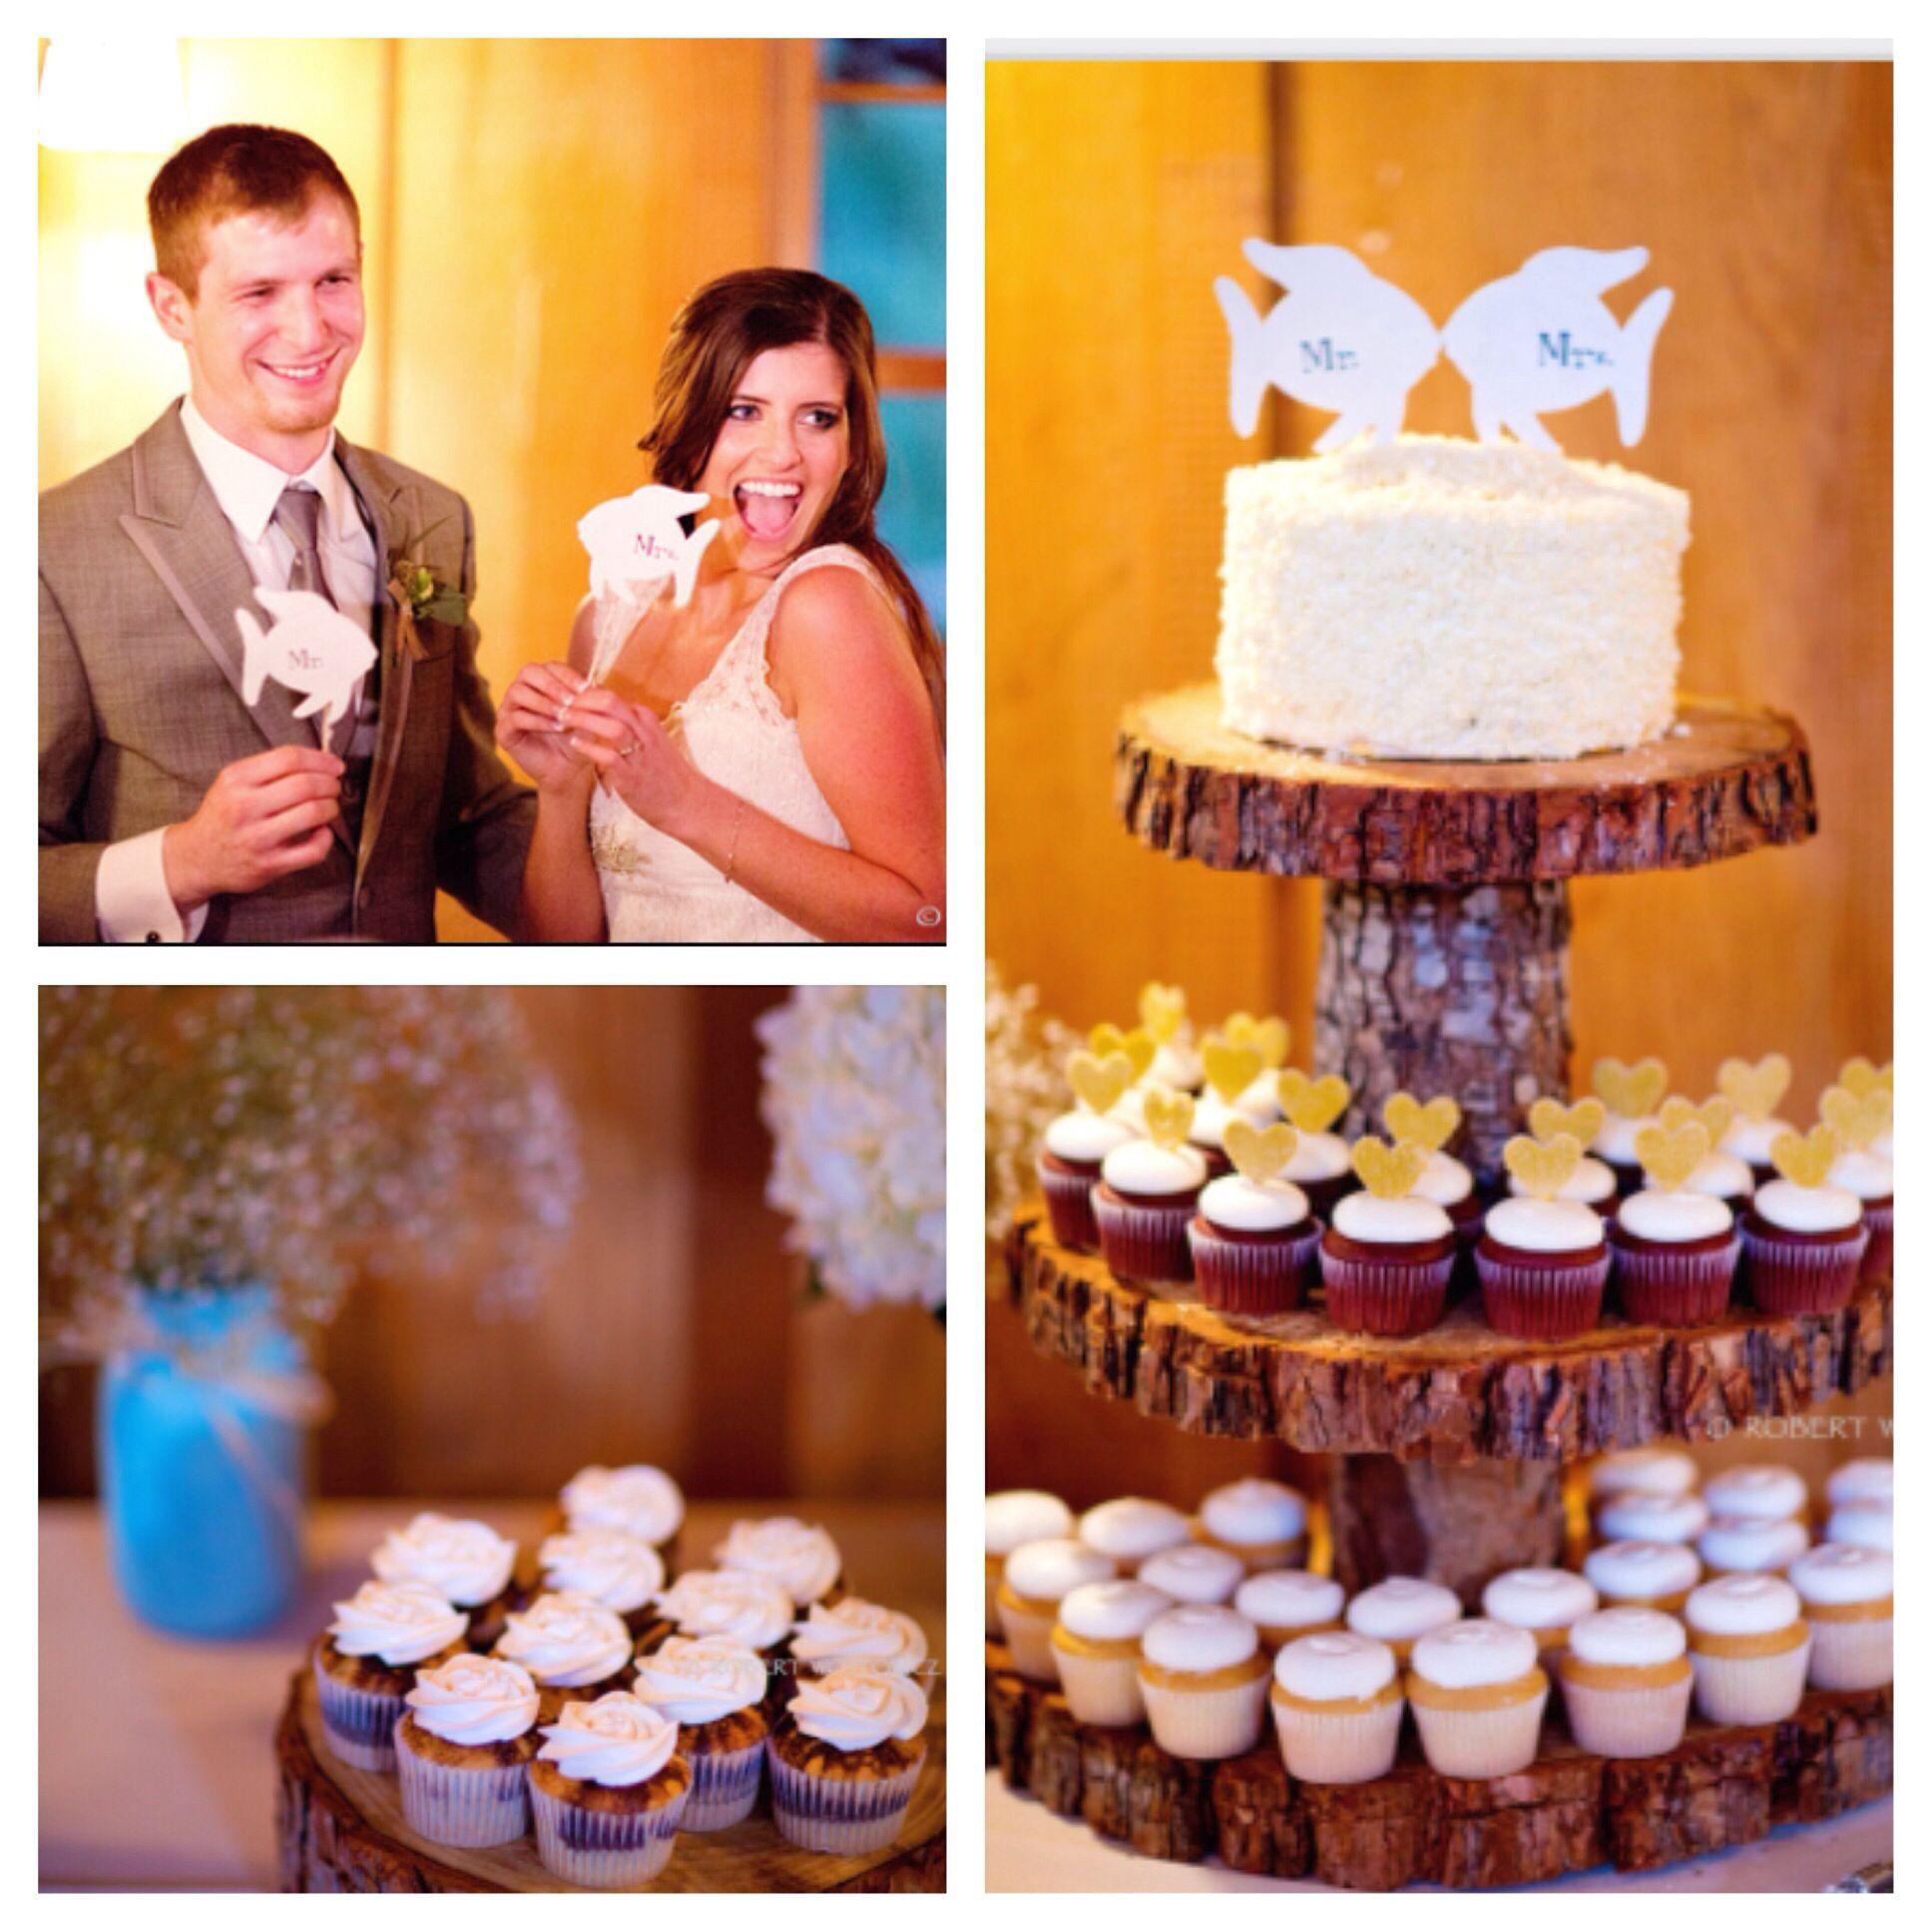 Mr & Mrs - An Alaskan couples dream cupcake tower! #nestledown #wedding #losgatos